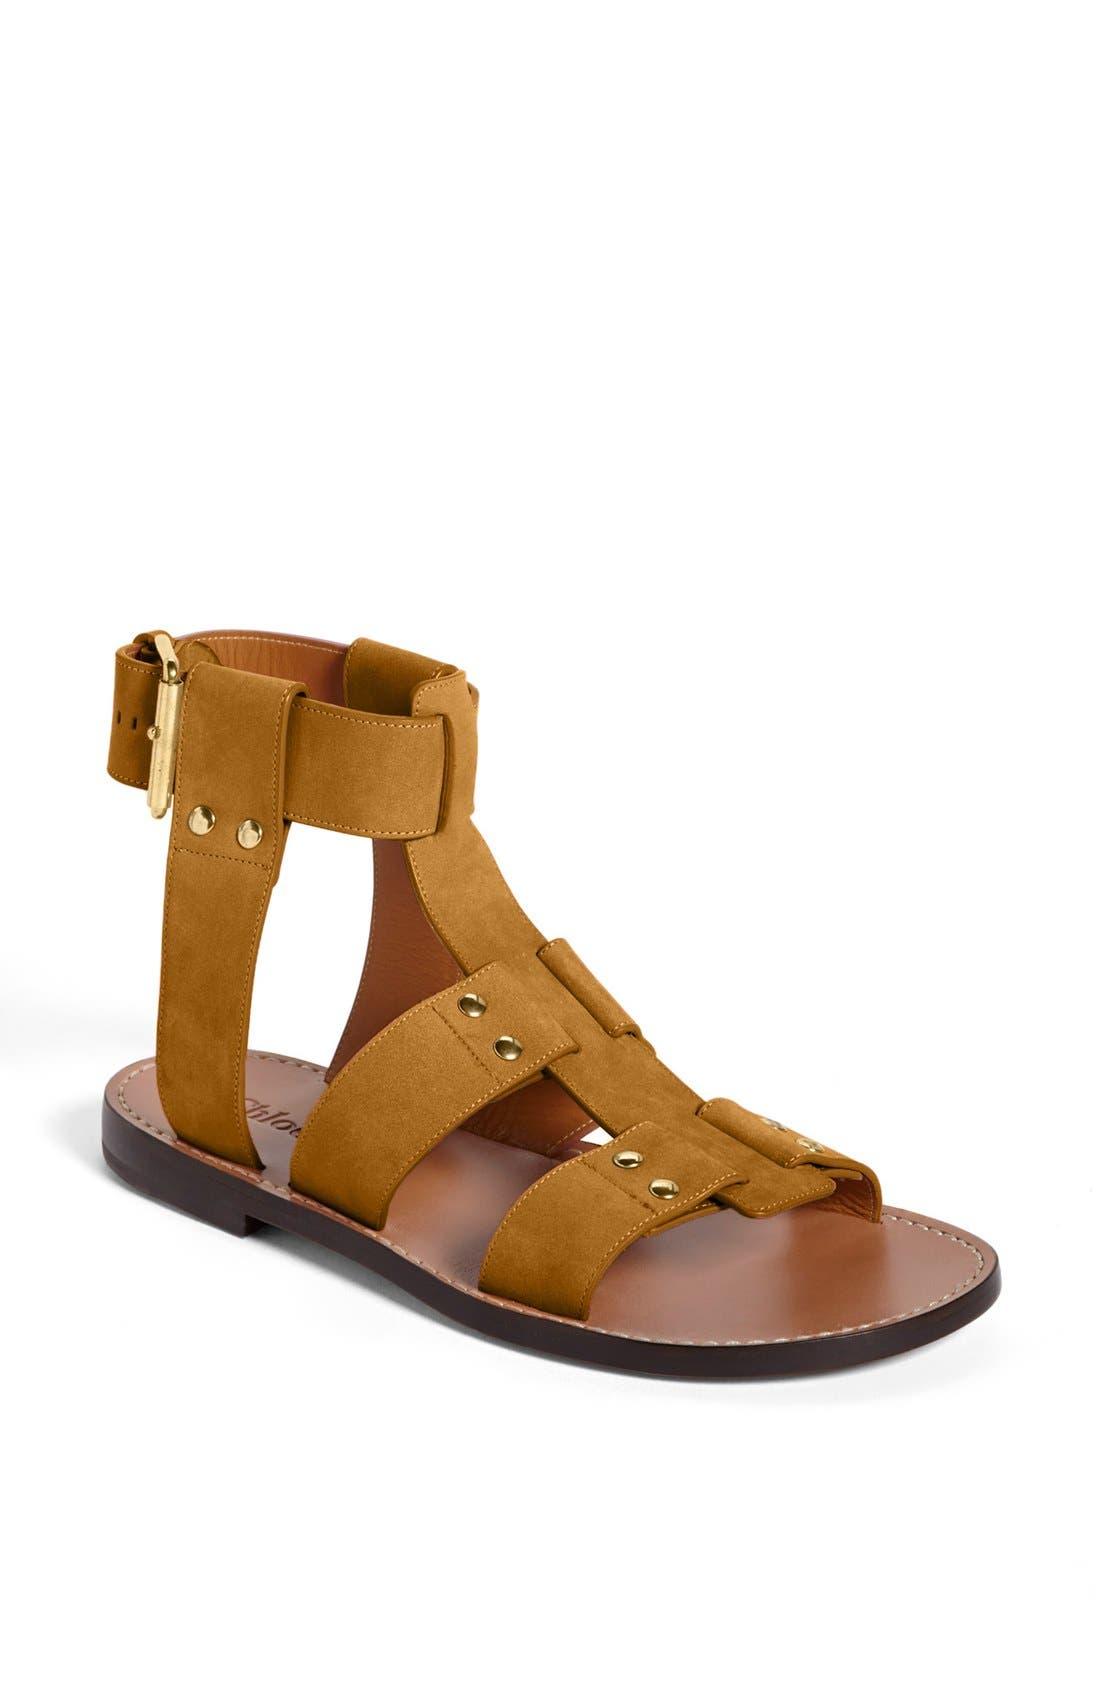 Main Image - Chloé 'Alaska' Flat Gladiator Sandal